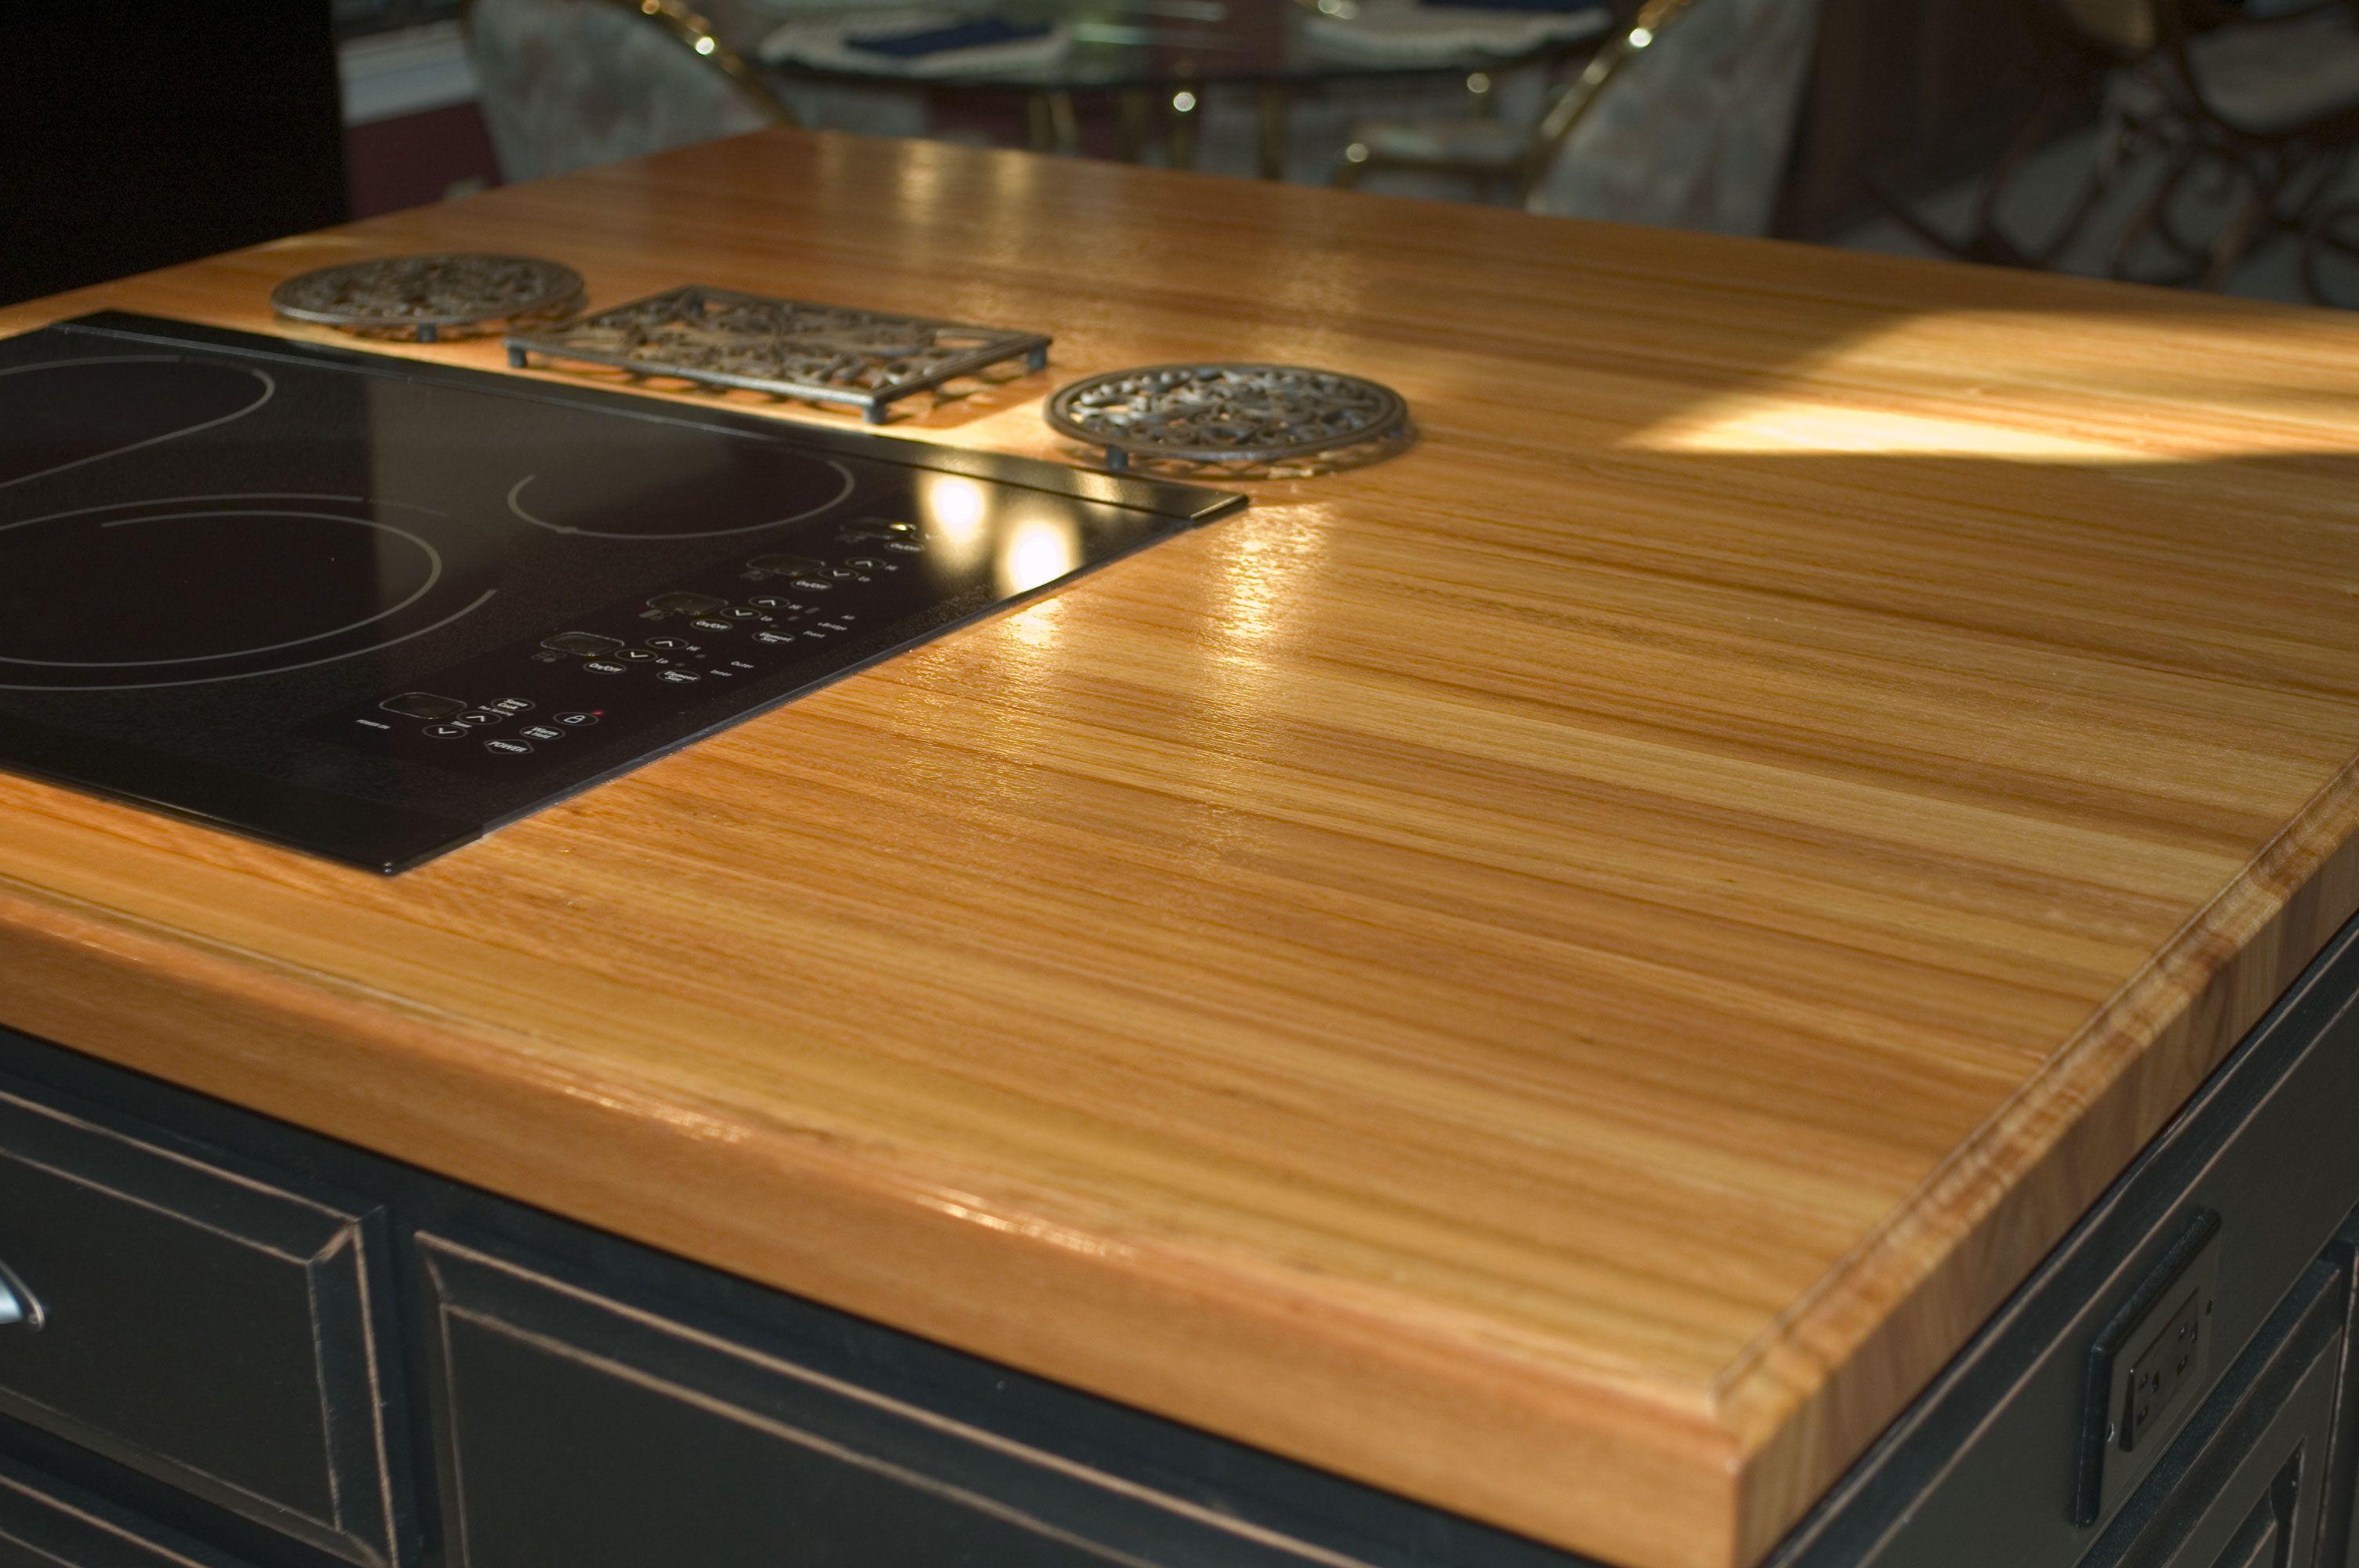 Pecan Wood Countertop Photo Gallery By Devos Custom